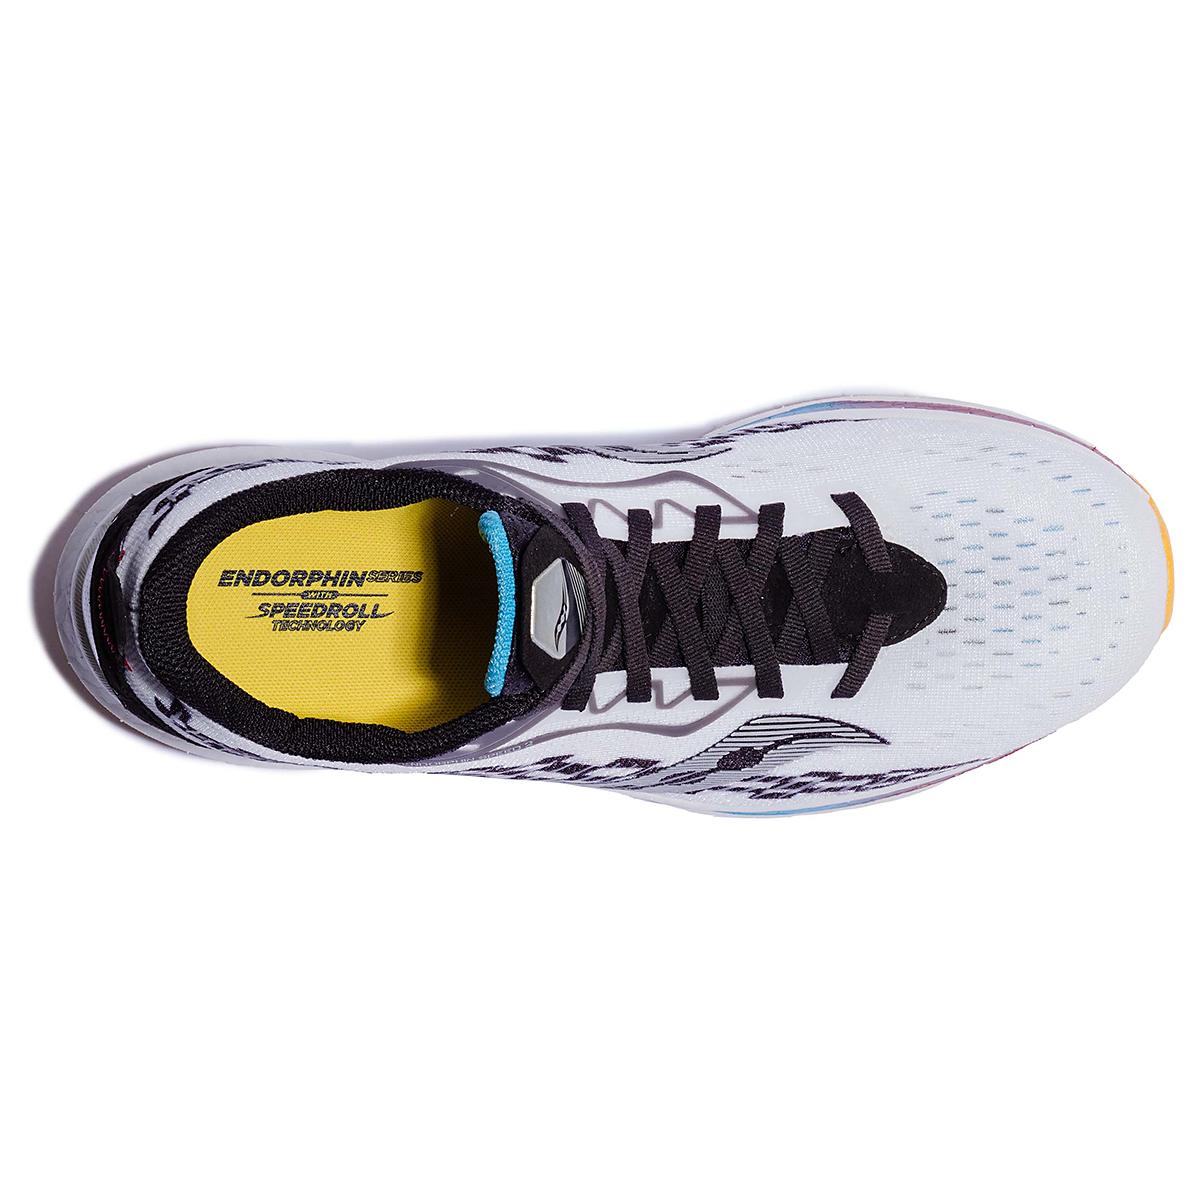 Men's Saucony Endorphin Speed 2 Running Shoe - Color: Reverie - Size: 7 - Width: Regular, Reverie, large, image 3